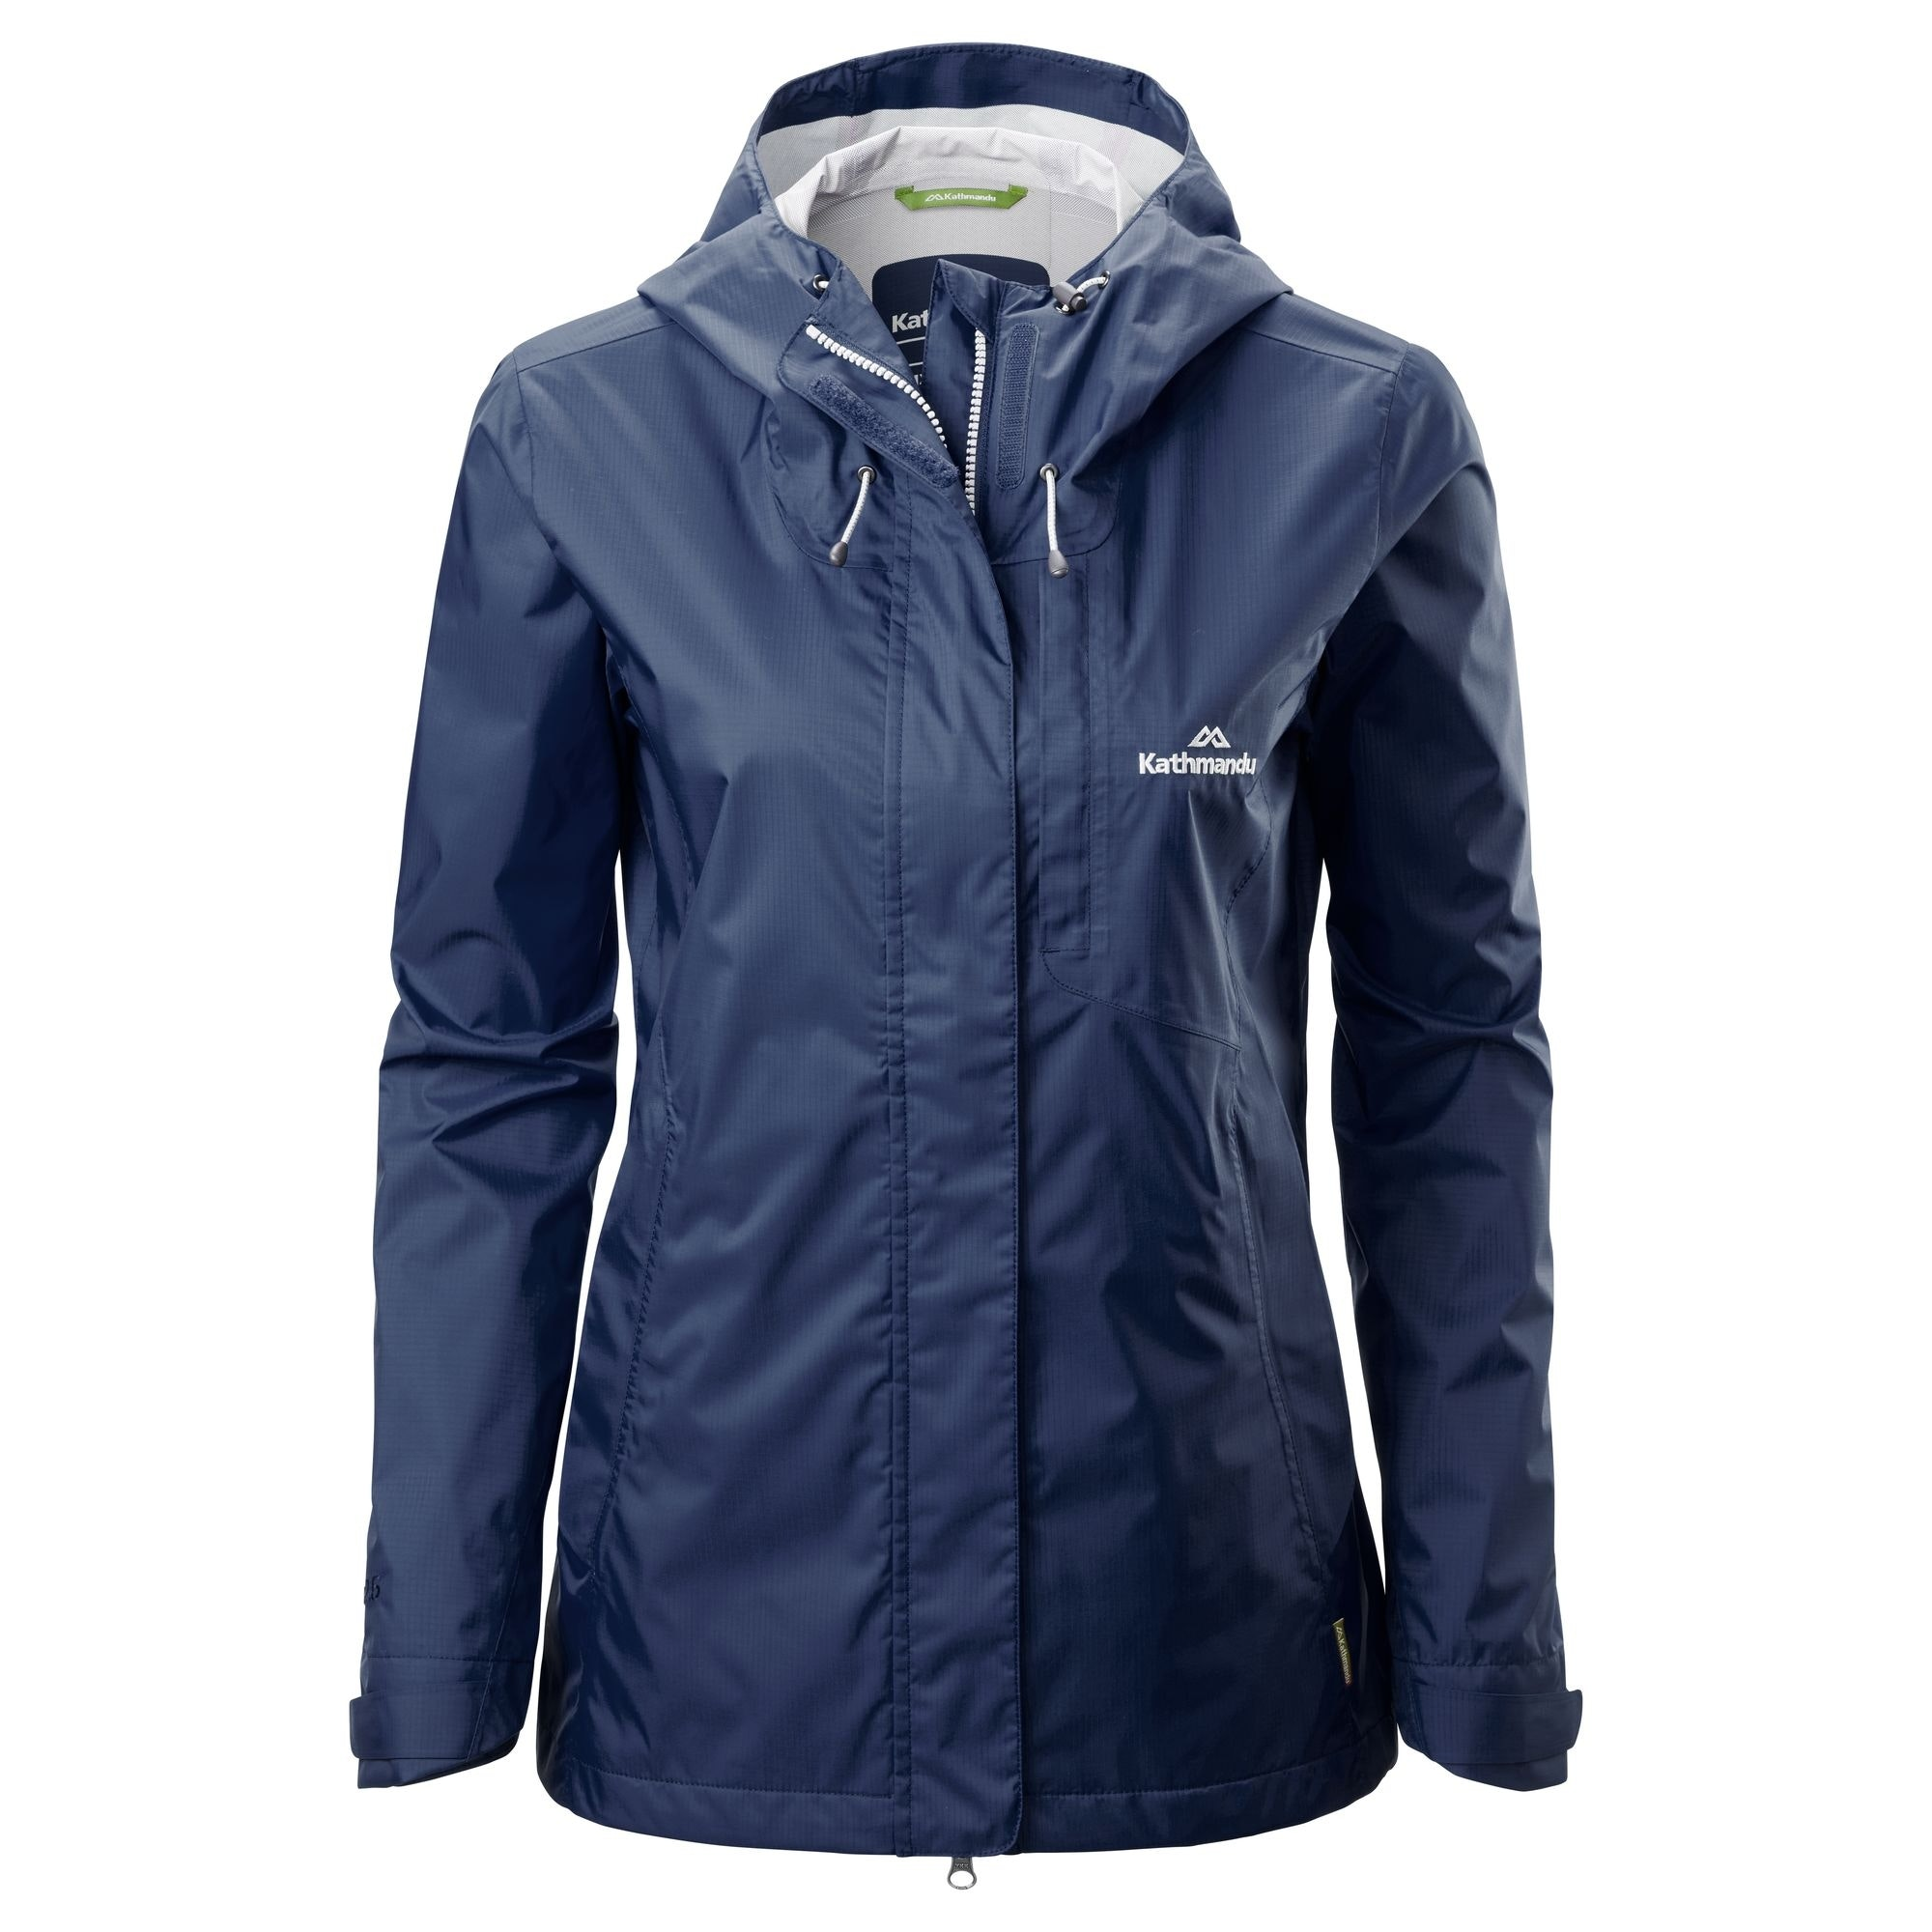 The 5 Best Waterproof Jackets For Running In The Rain (Men's